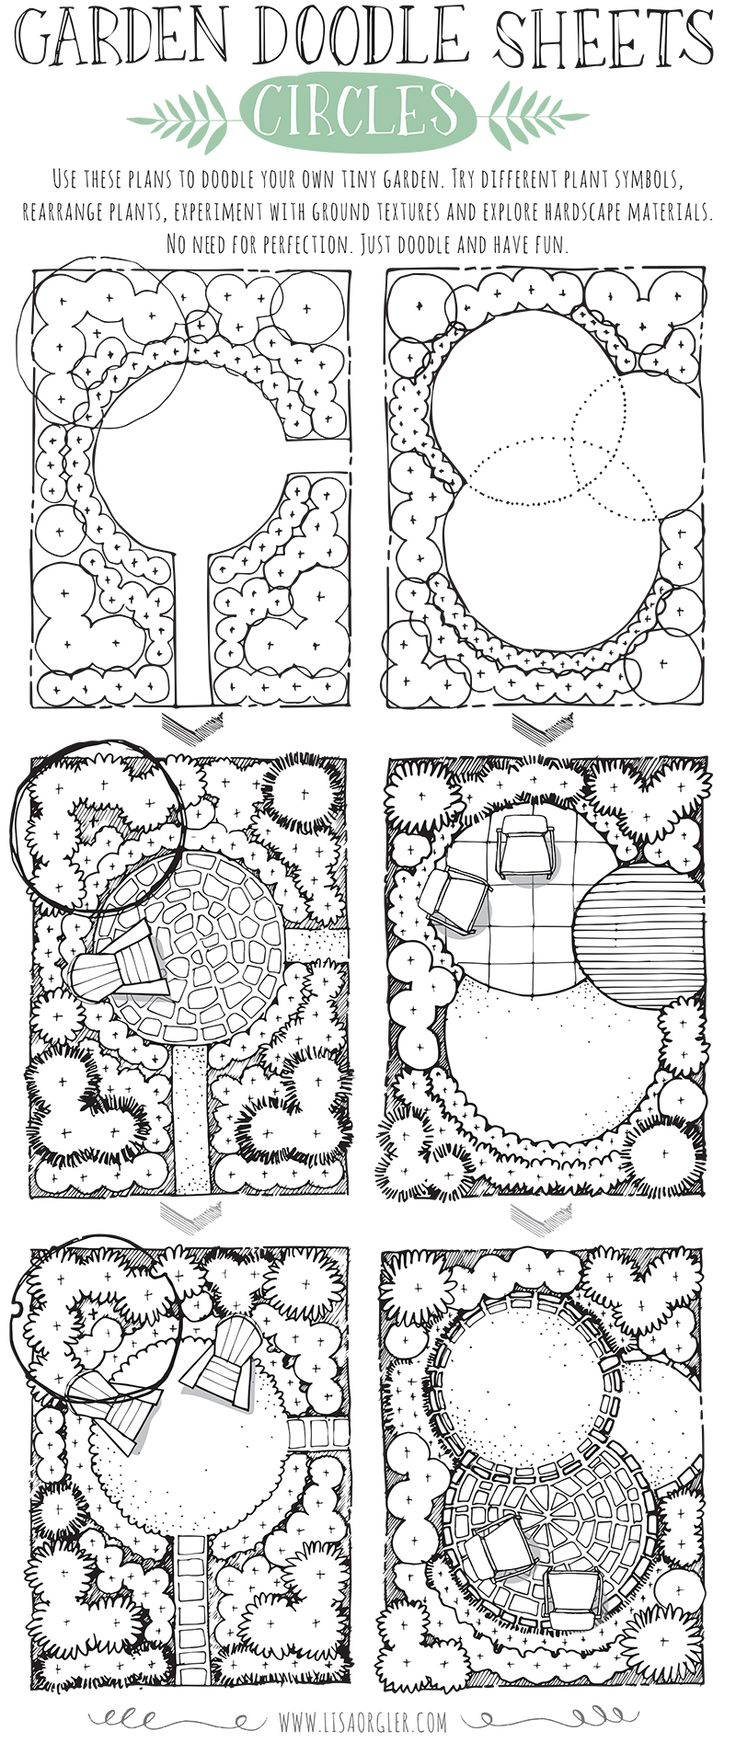 256 best Basic principles for Garden Design images on Pinterest